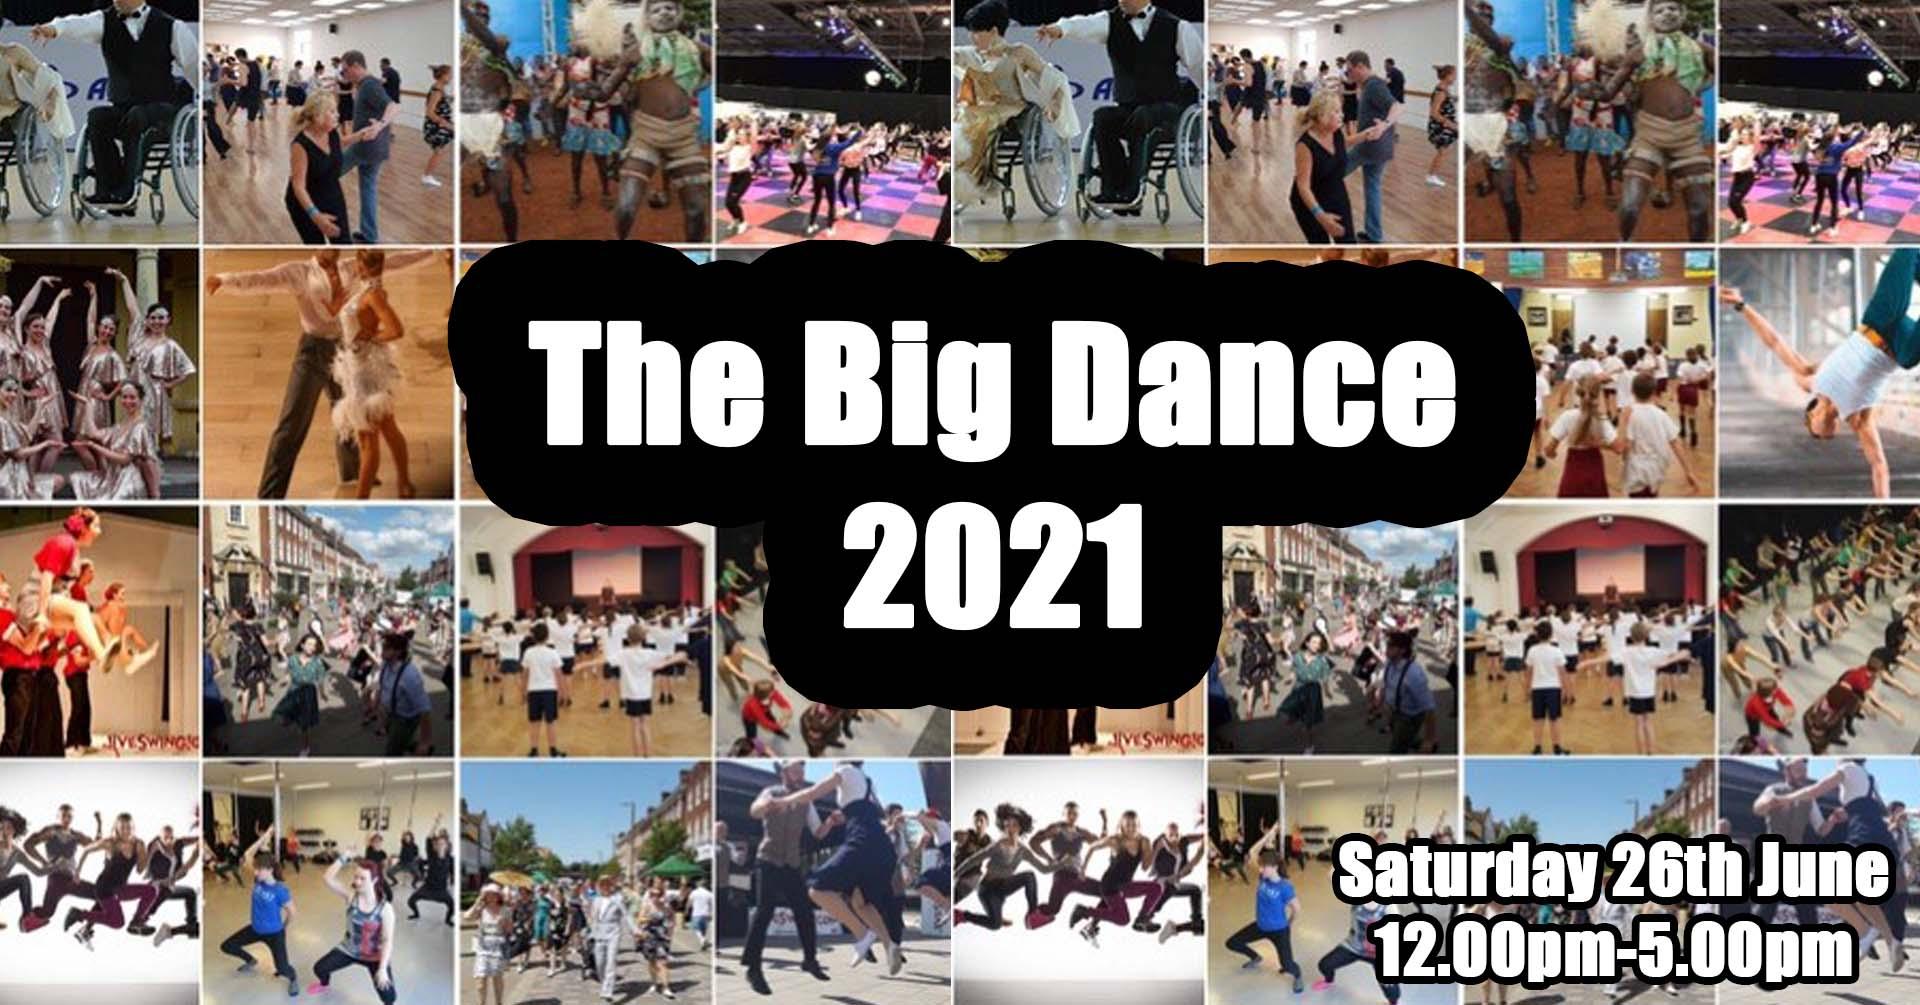 The Big Dance 2021